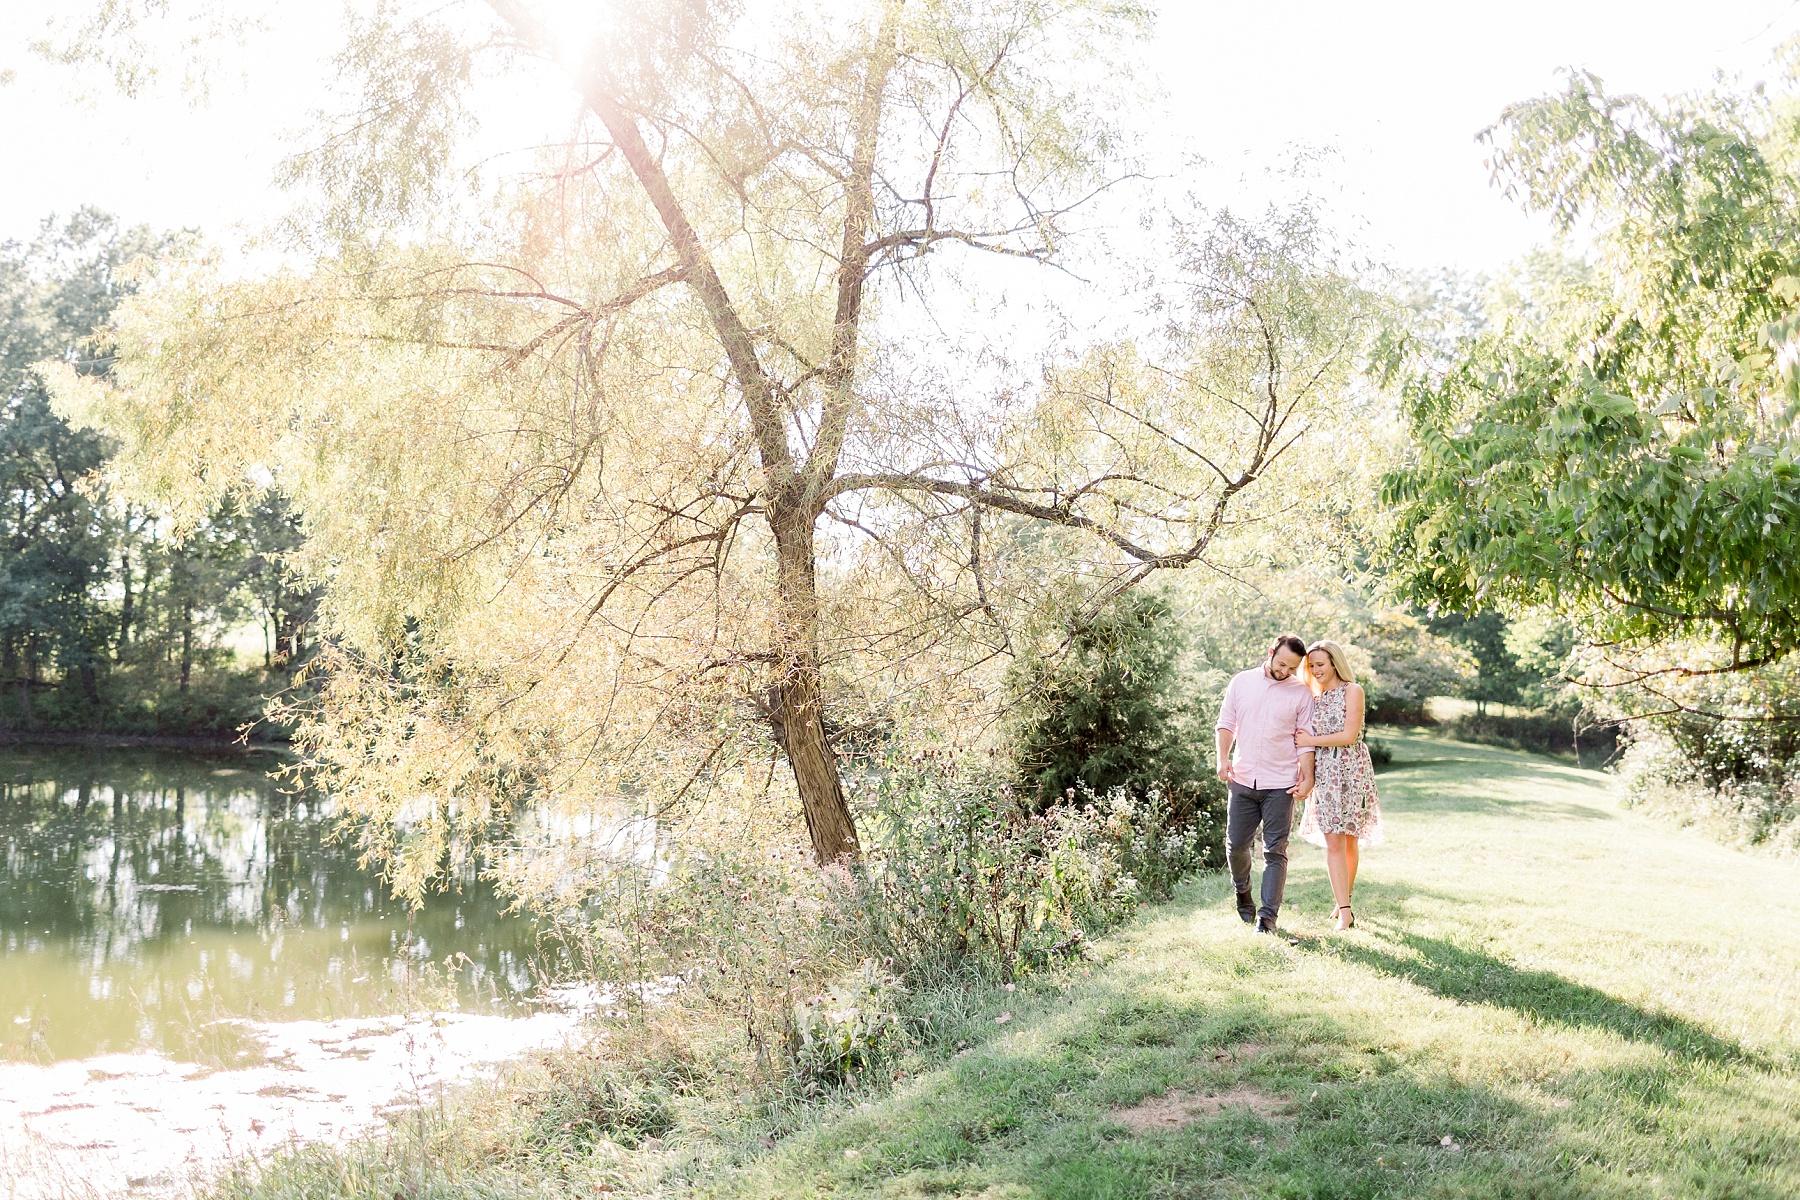 adventurous-authentic-wedding-engagement-photography-kansas-city-elizabeth-ladean-photo_5391.jpg